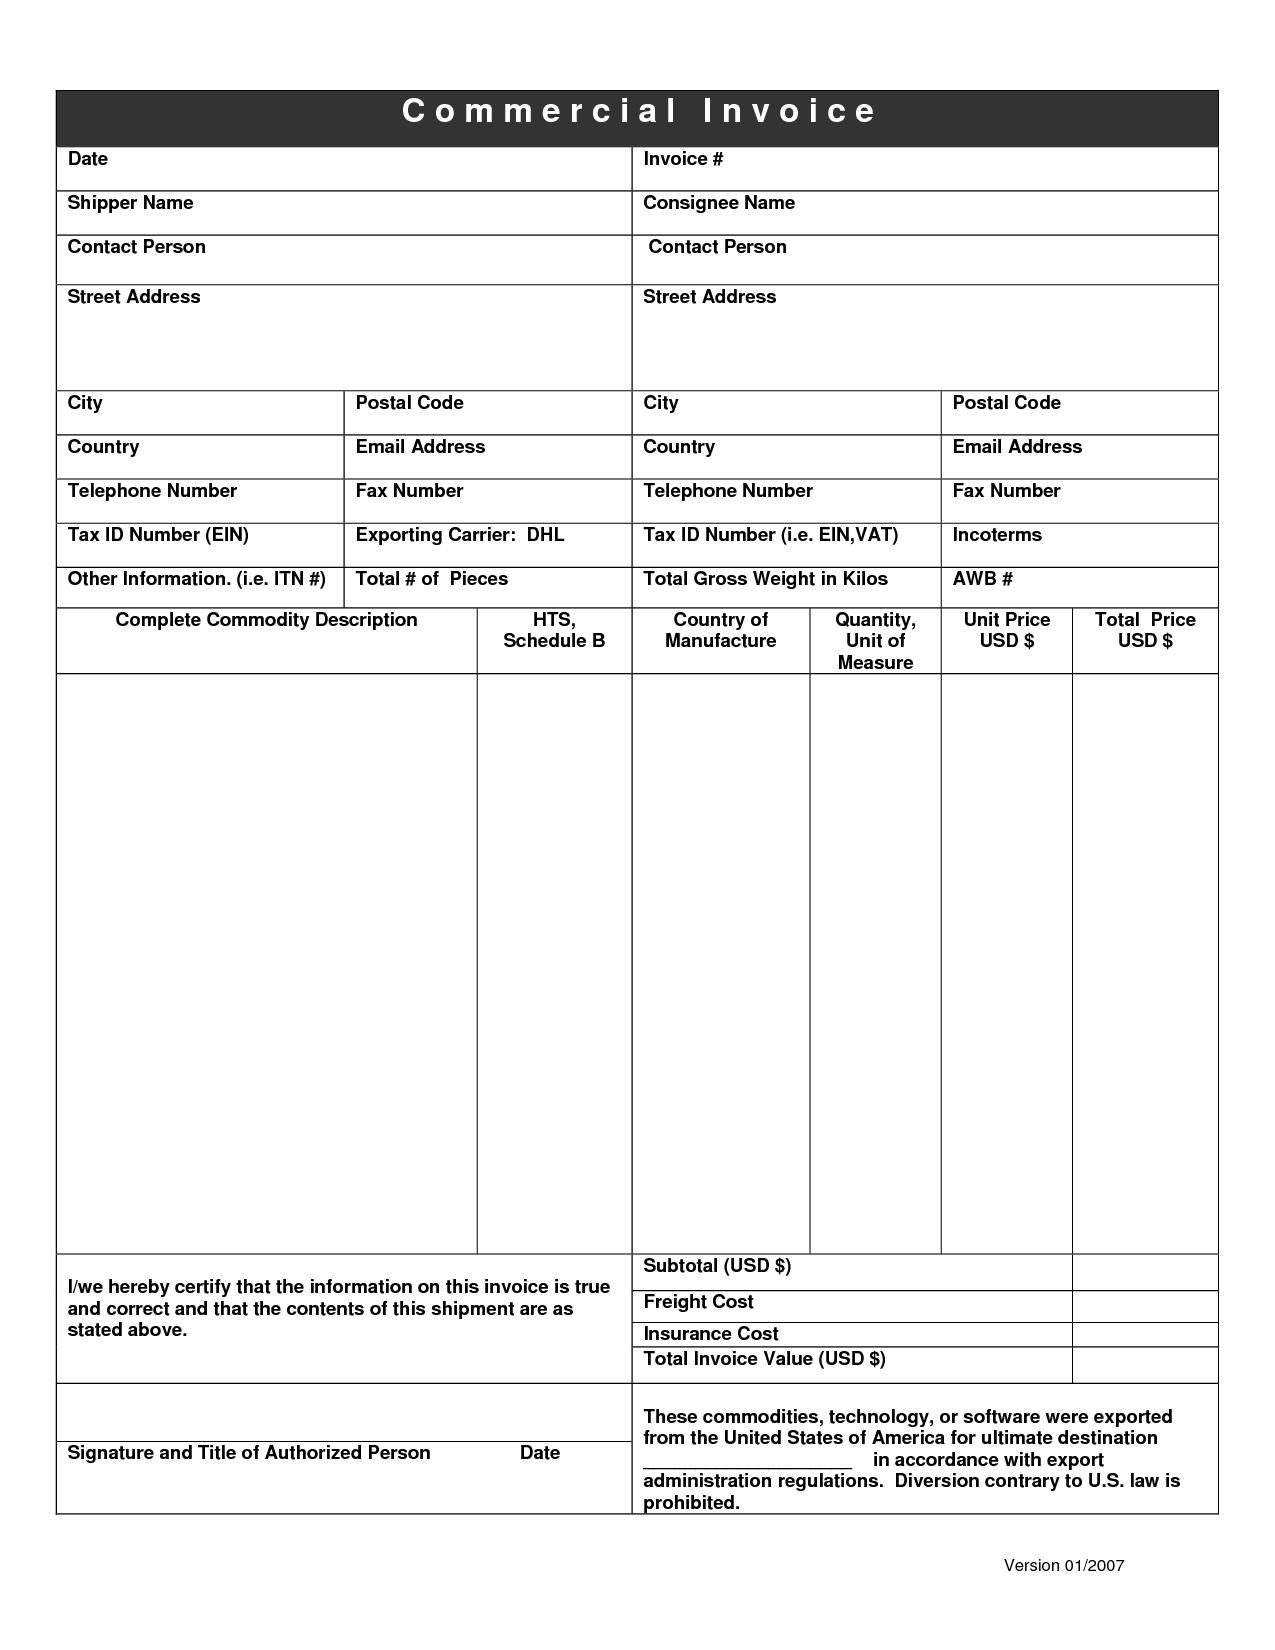 dhl invoice form invoice template ideas. Black Bedroom Furniture Sets. Home Design Ideas